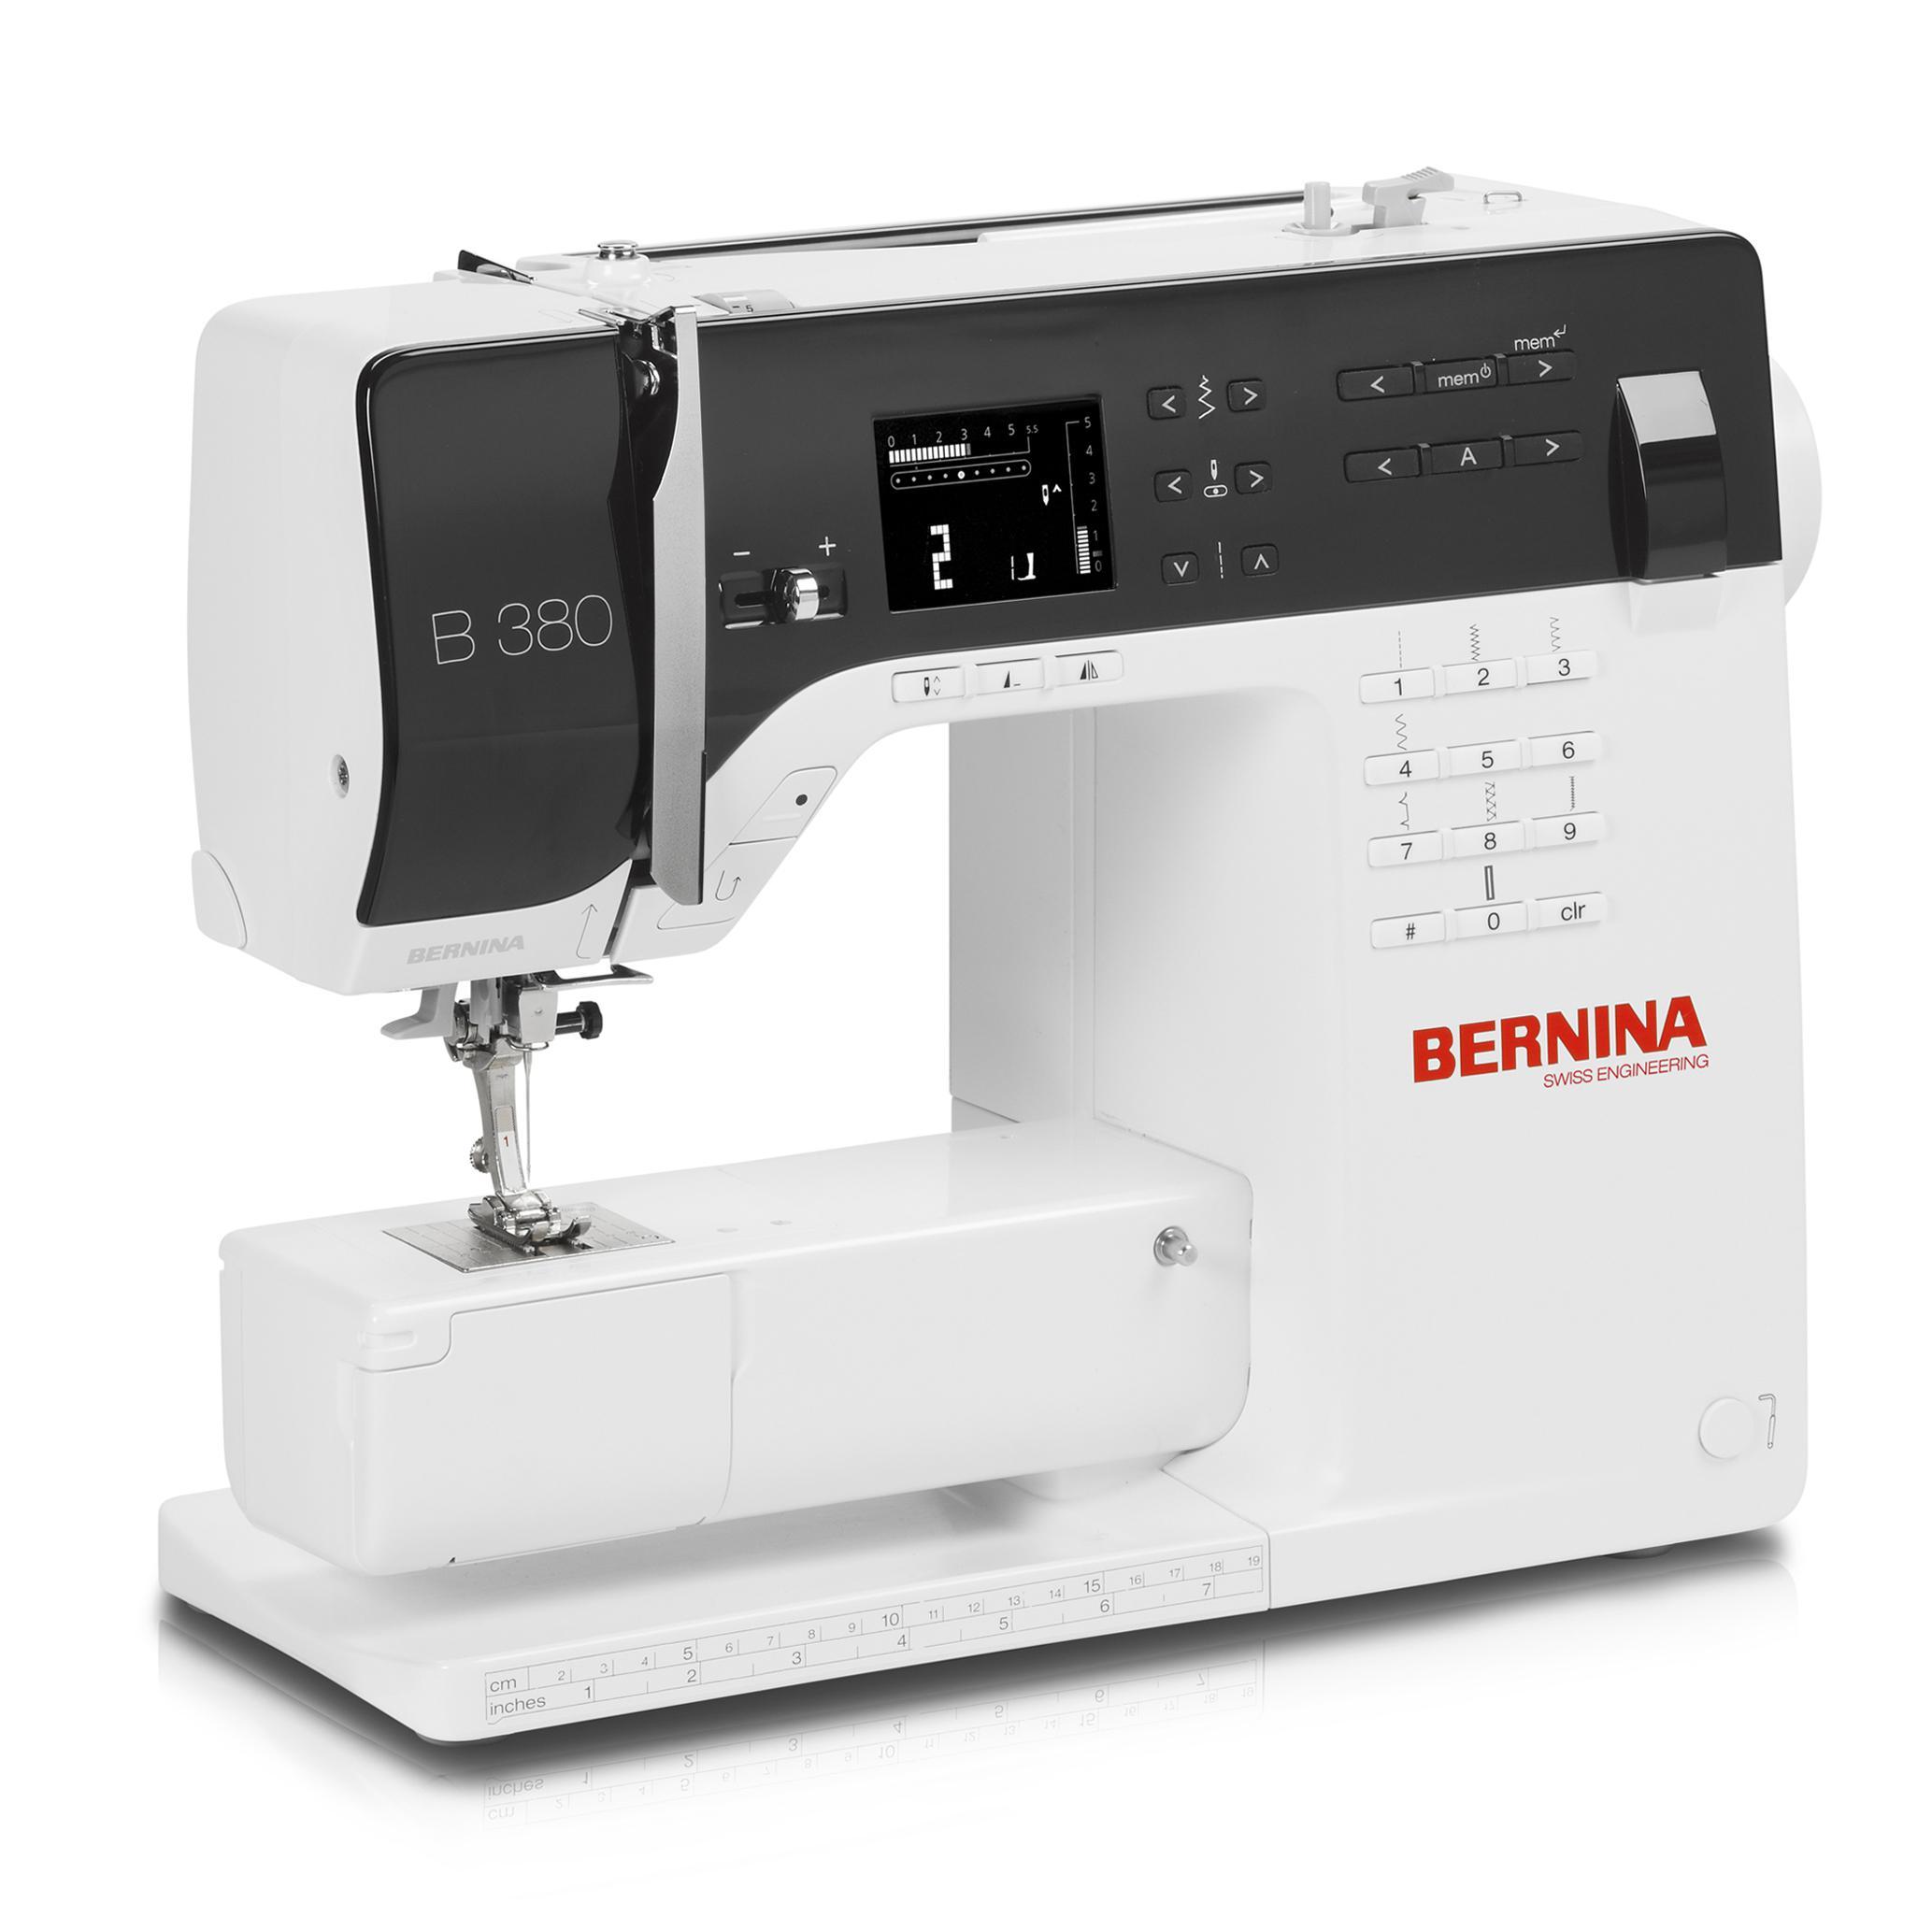 Bernina-380-B380-Sewing-machine3